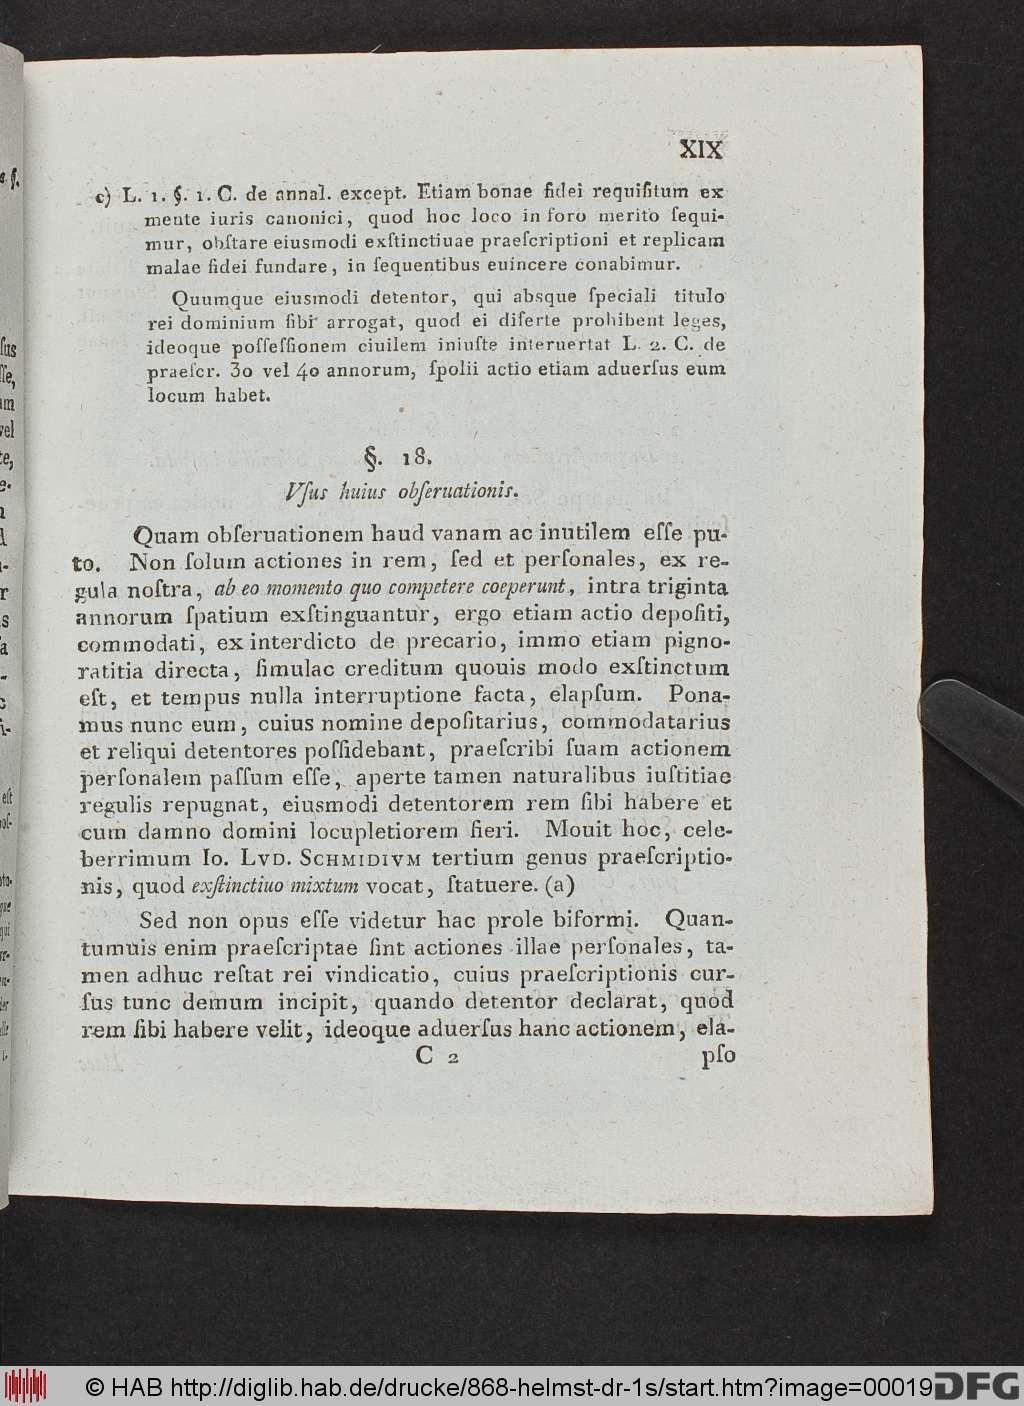 https://diglib.hab.de/drucke/868-helmst-dr-1s/00019.jpg